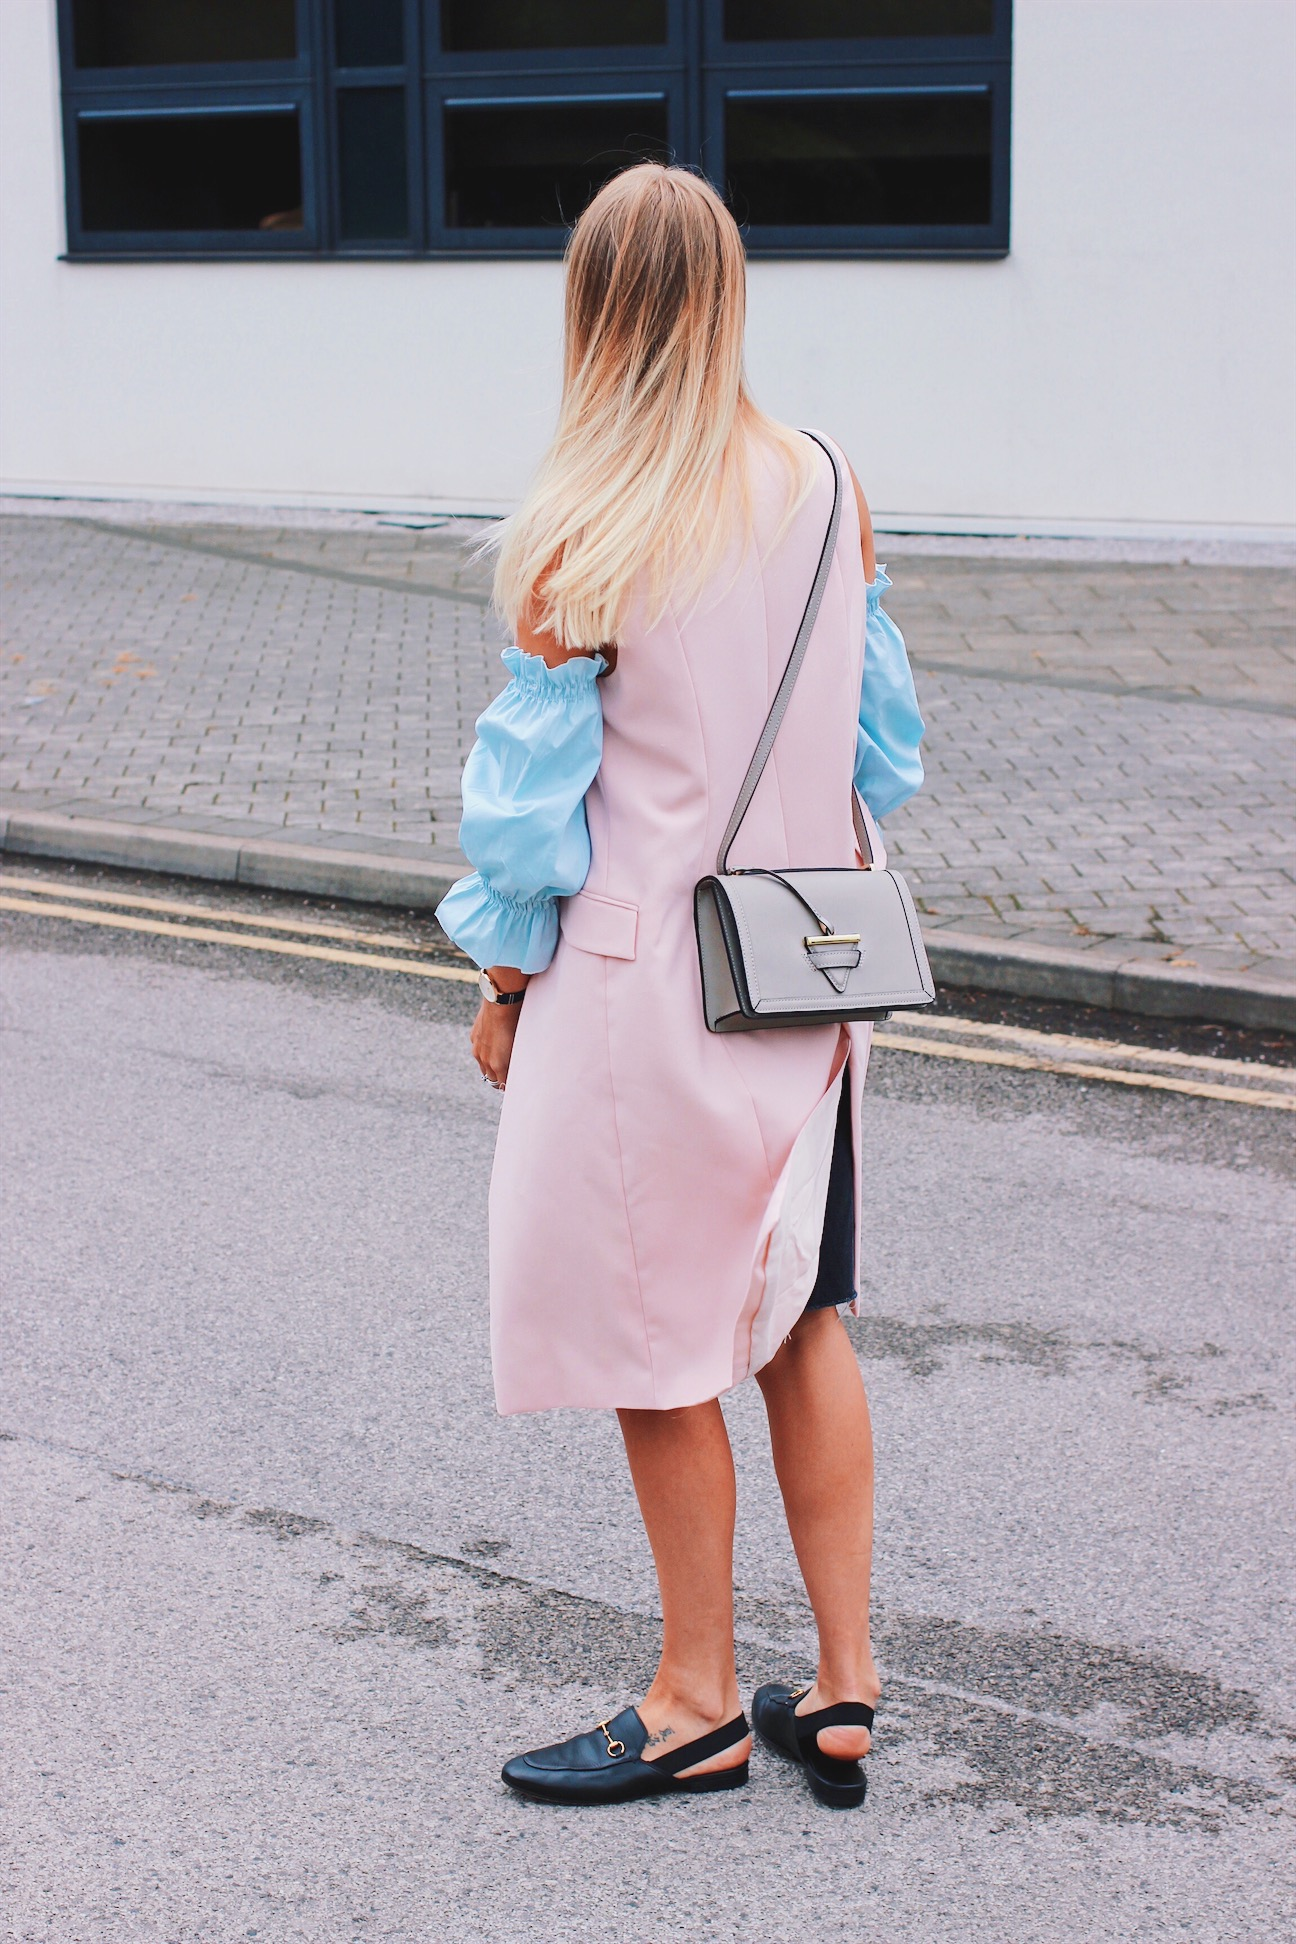 Camelia Roma Bag on Fashion Blog